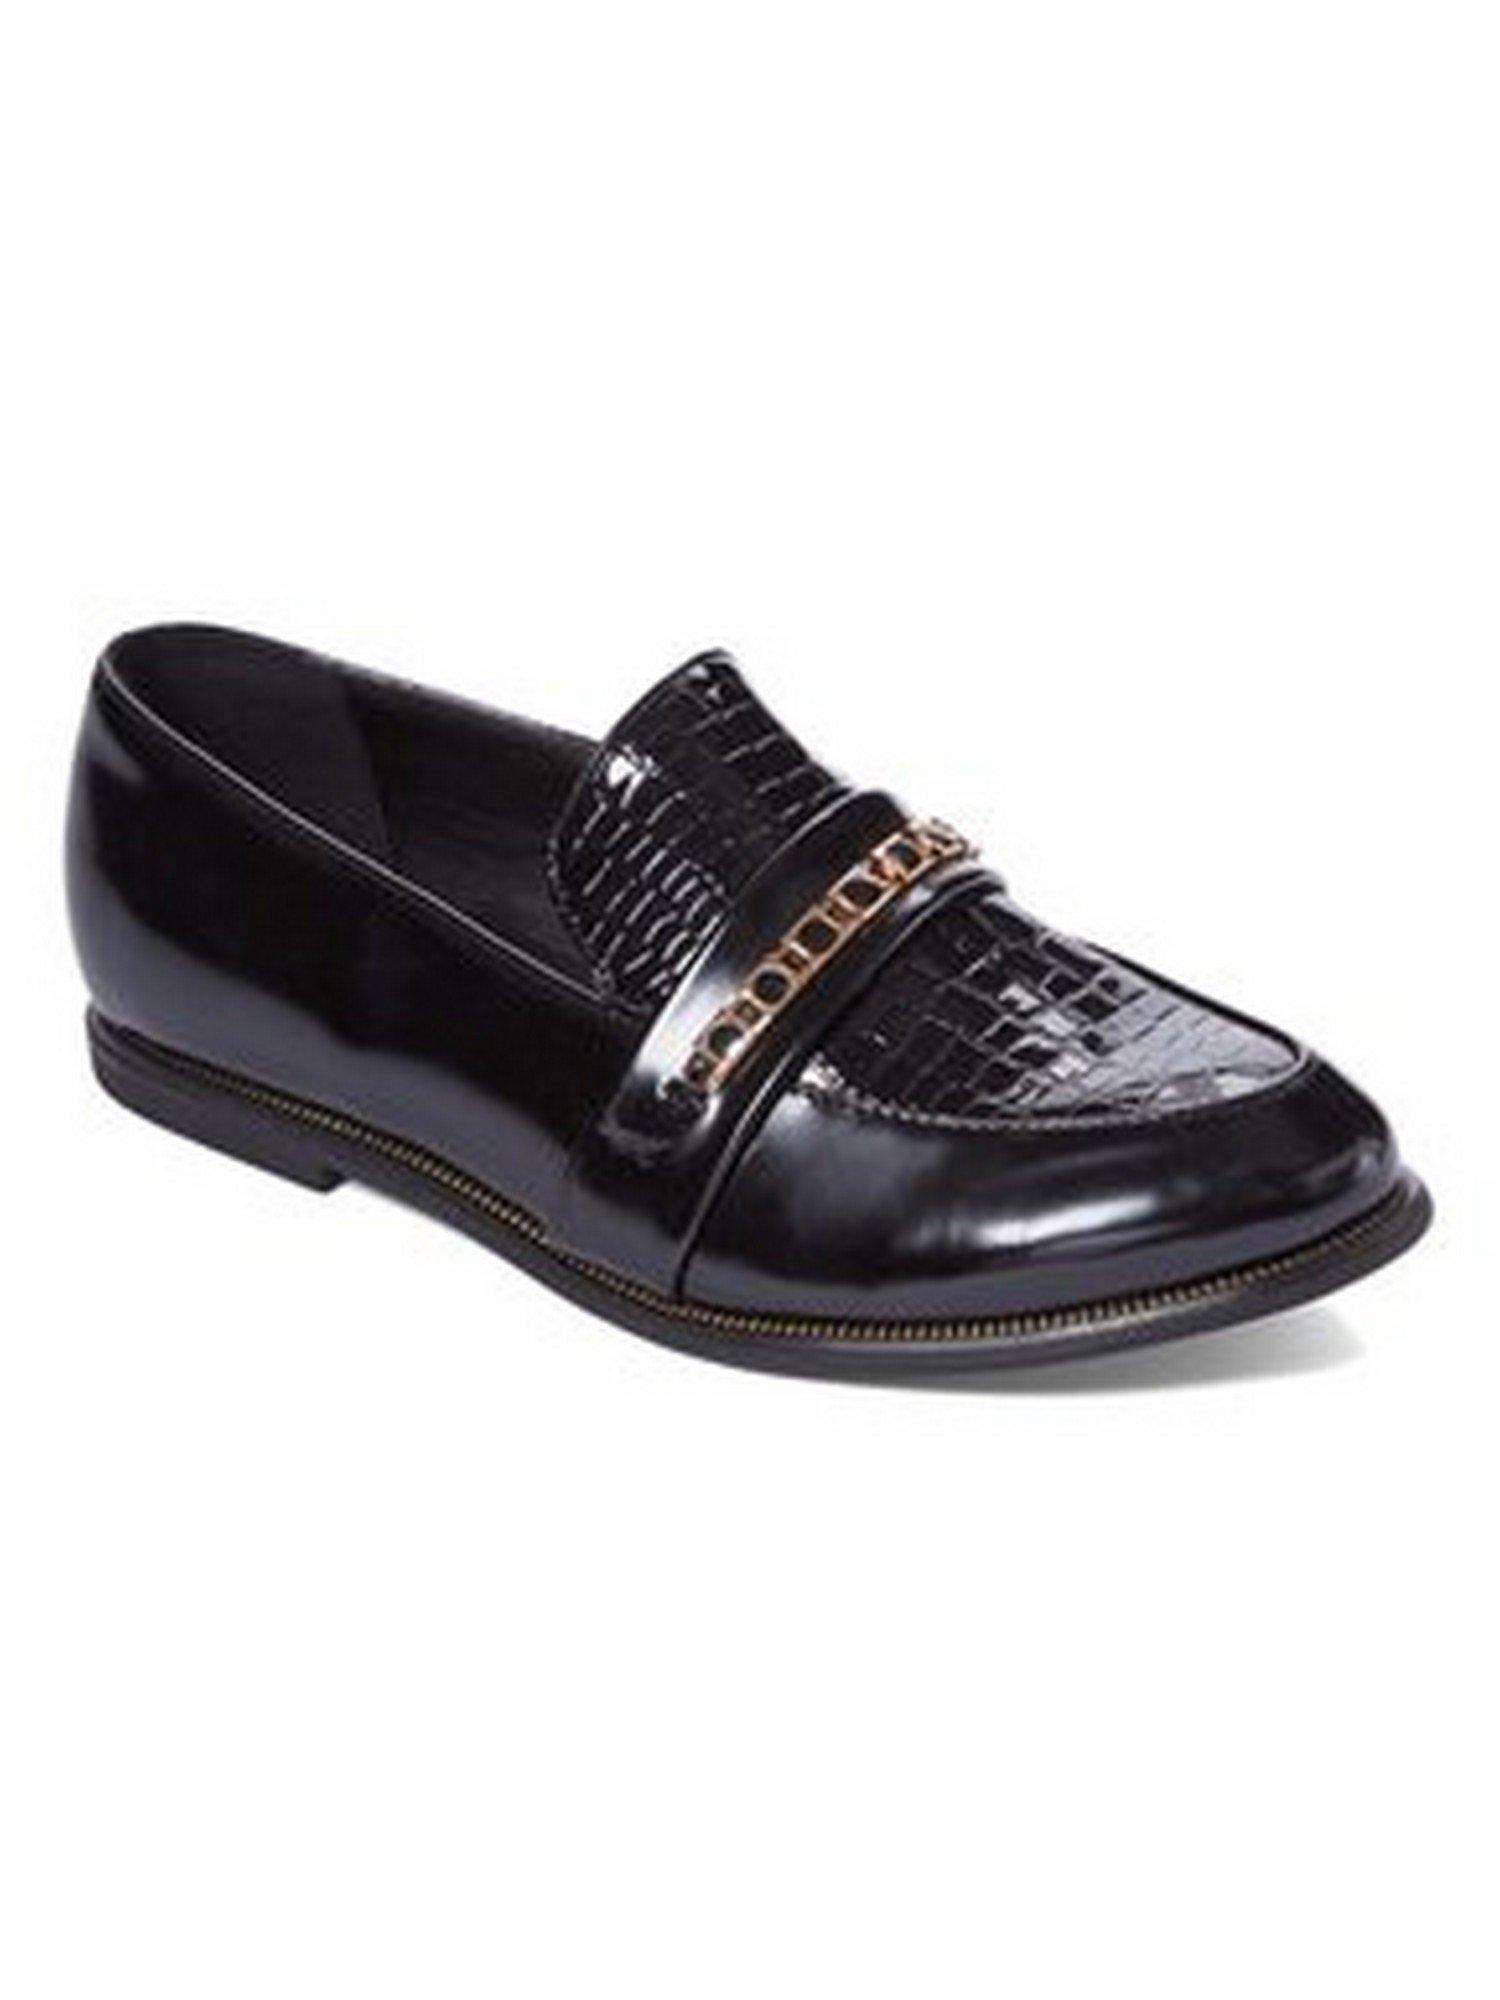 Liyu Adult Black Snake Skin Top Panel Stone Accented Slip-On Shoes 6 Women